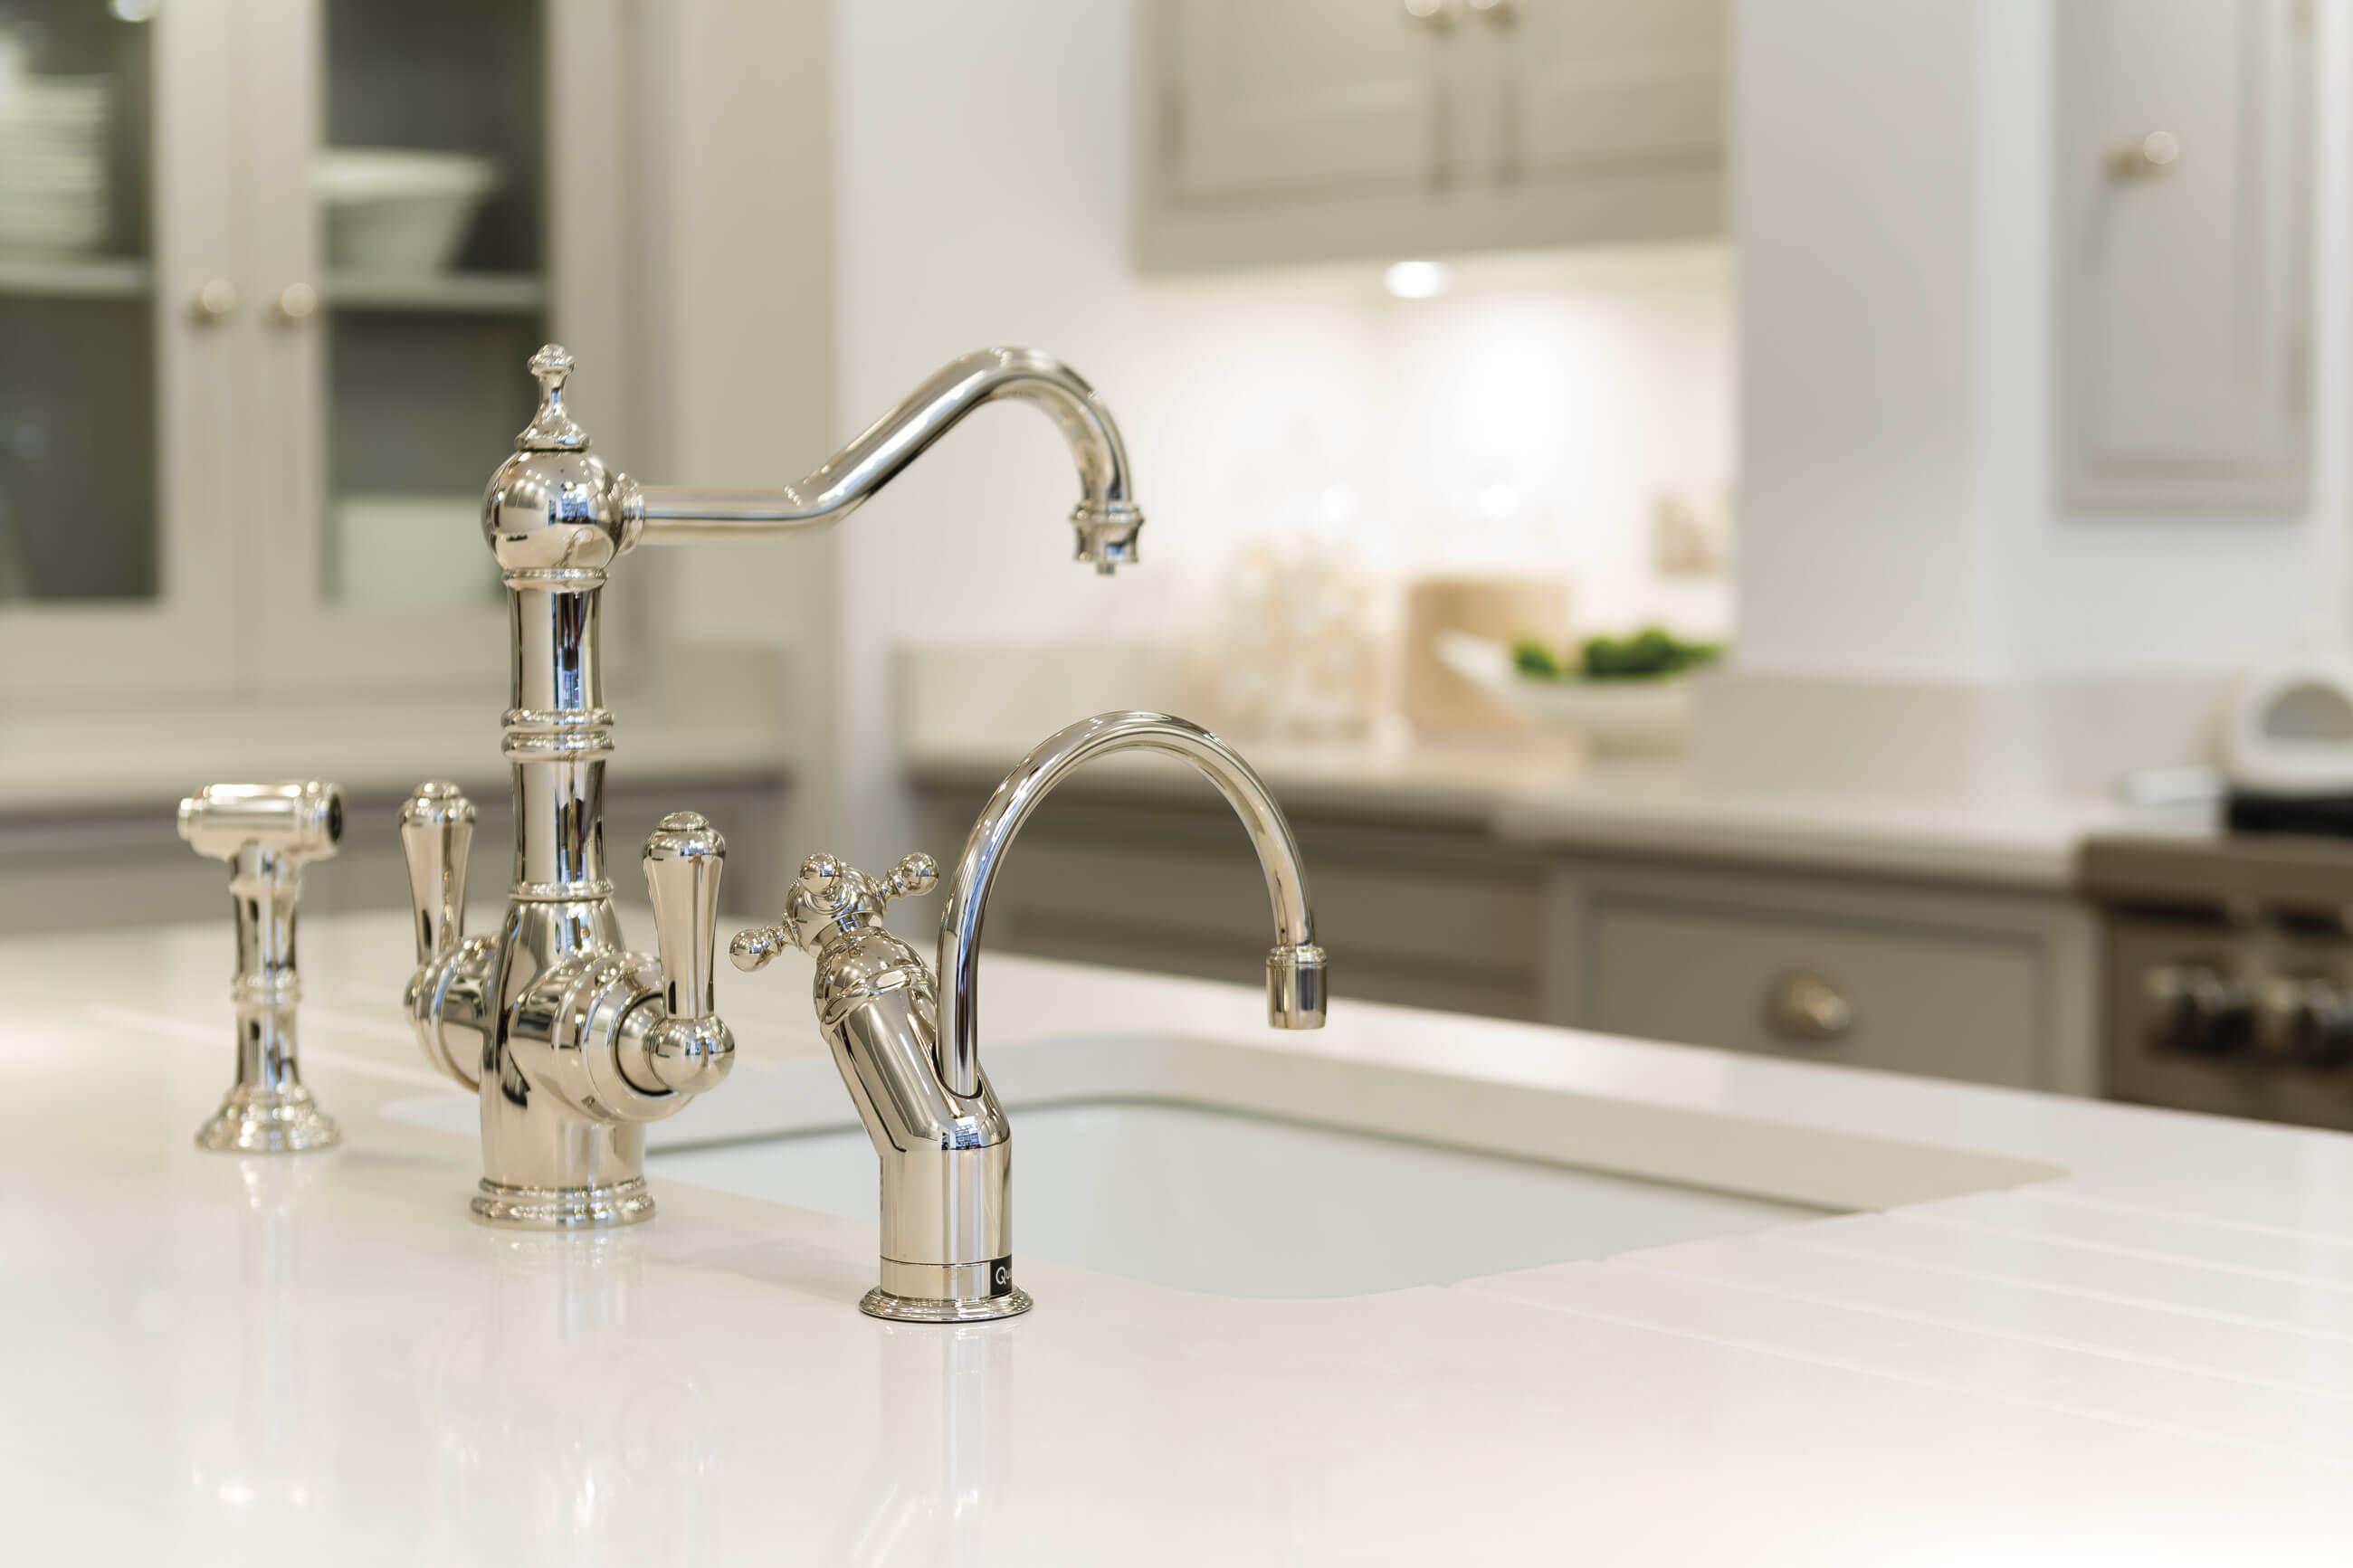 Generic Exquisite Kitchen Faucet Dual